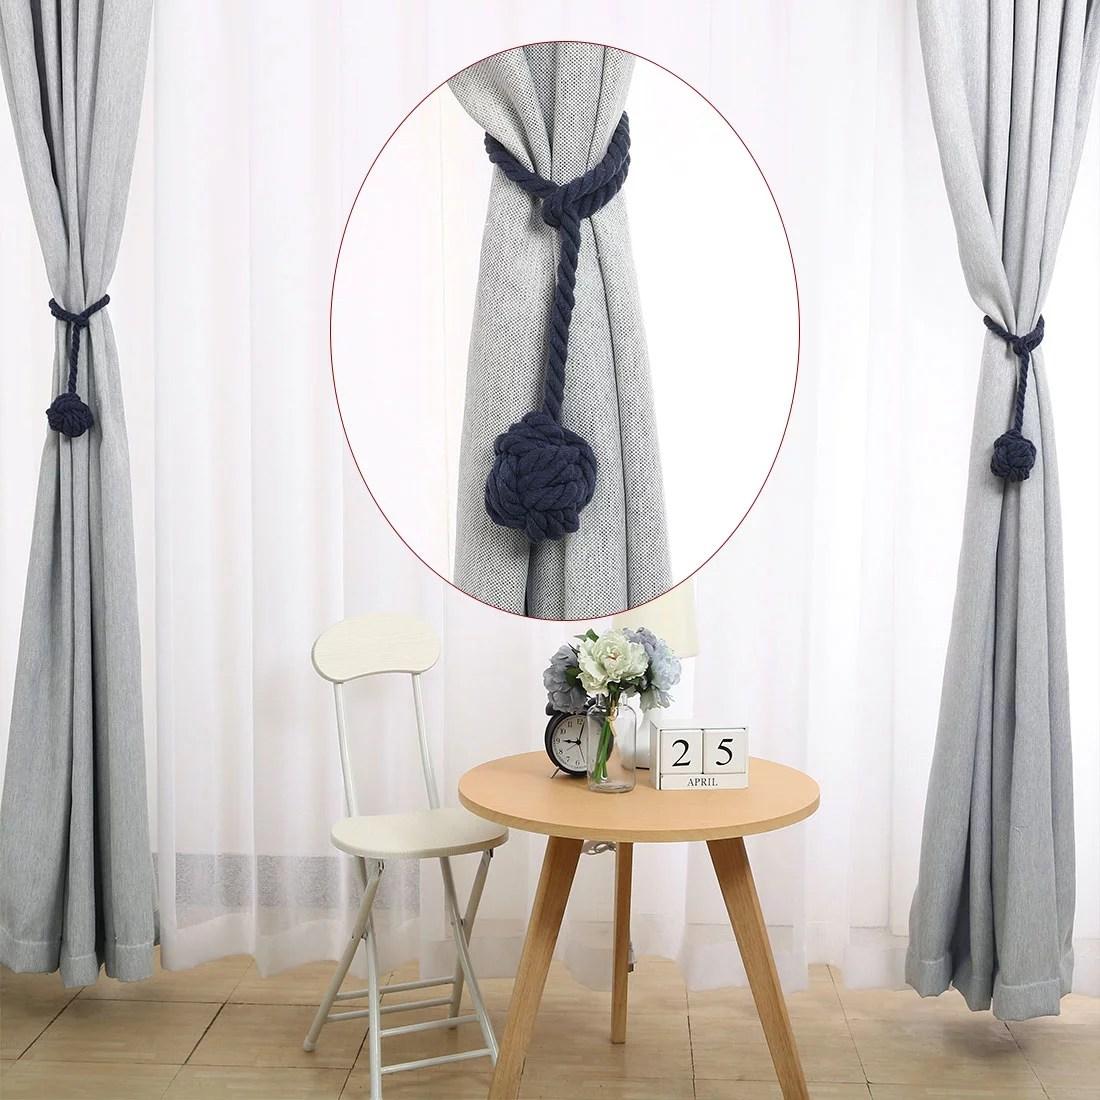 2pcs navy blue curtain tieback durable multi used easy install holdback decorative knitting rope curtain holders